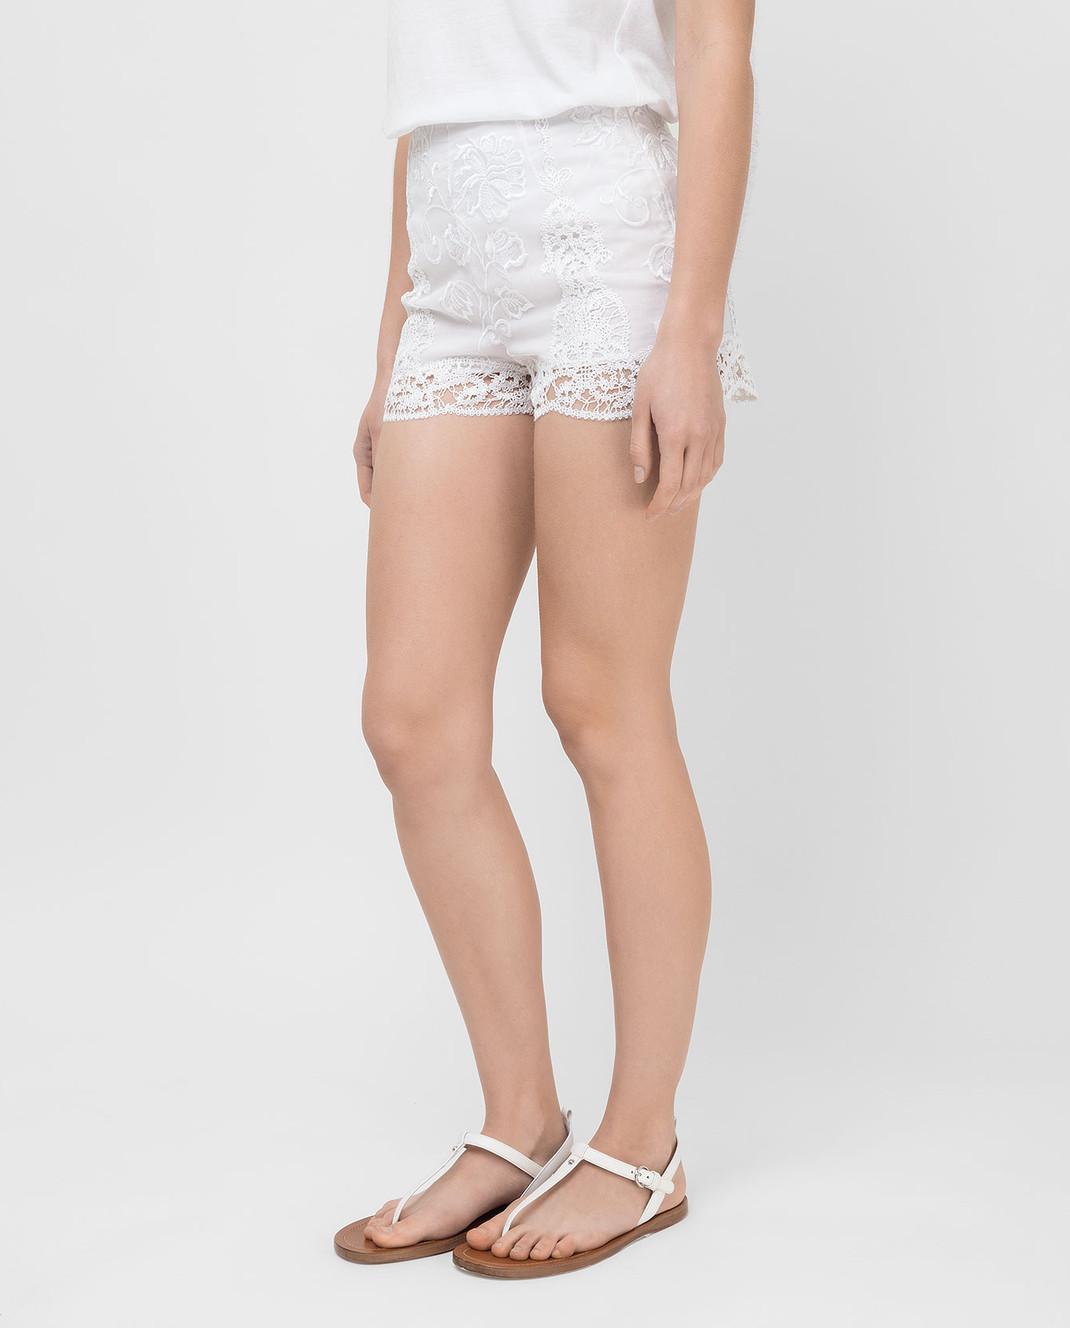 Charo Ruiz Белые шорты 00372 изображение 3